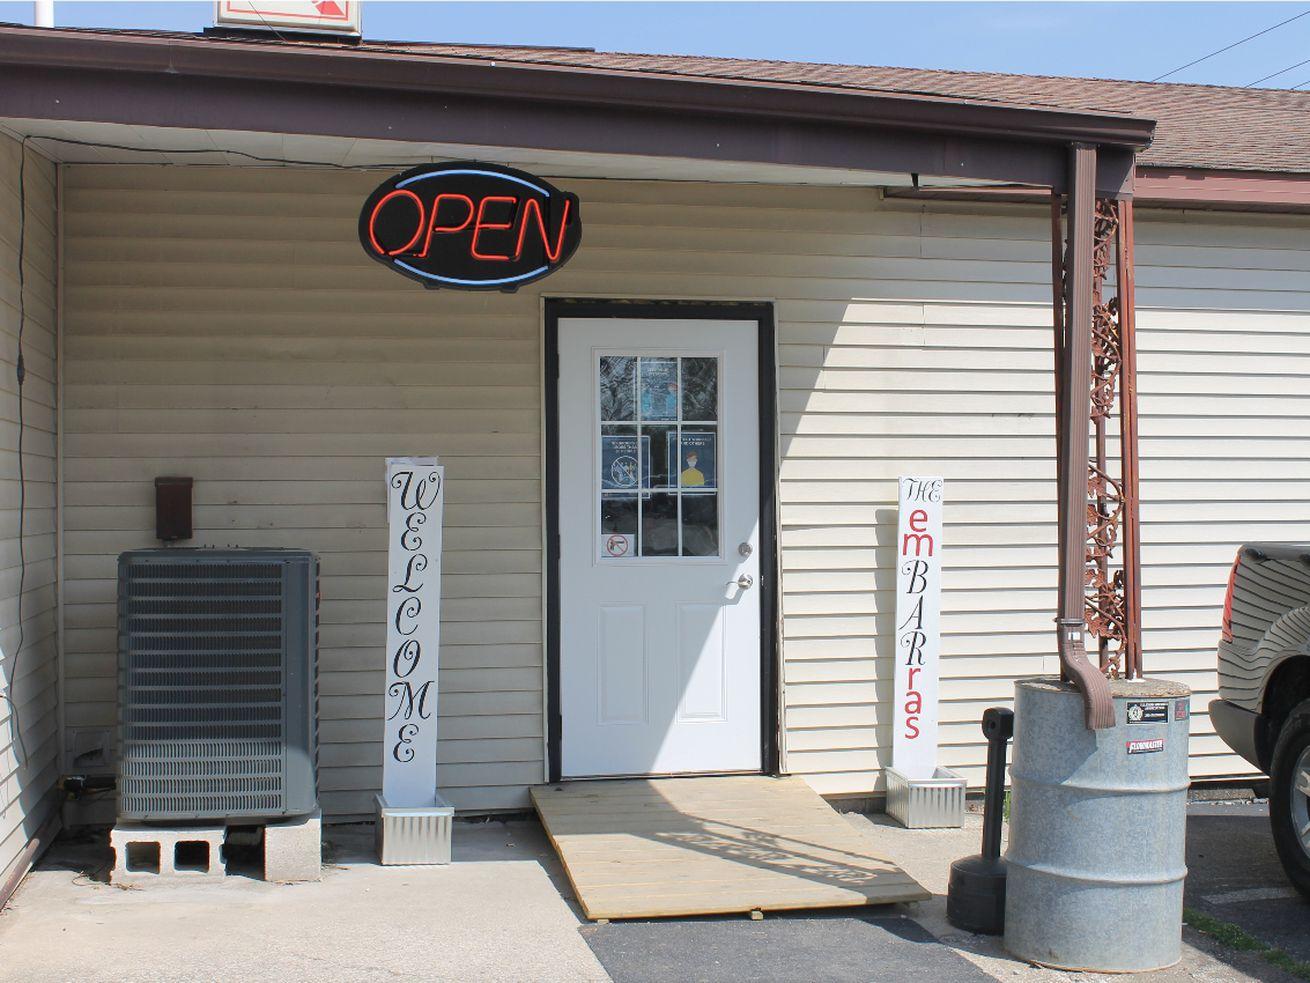 The entrance to the Embarras bar in downstate Villa Grove, Ill.